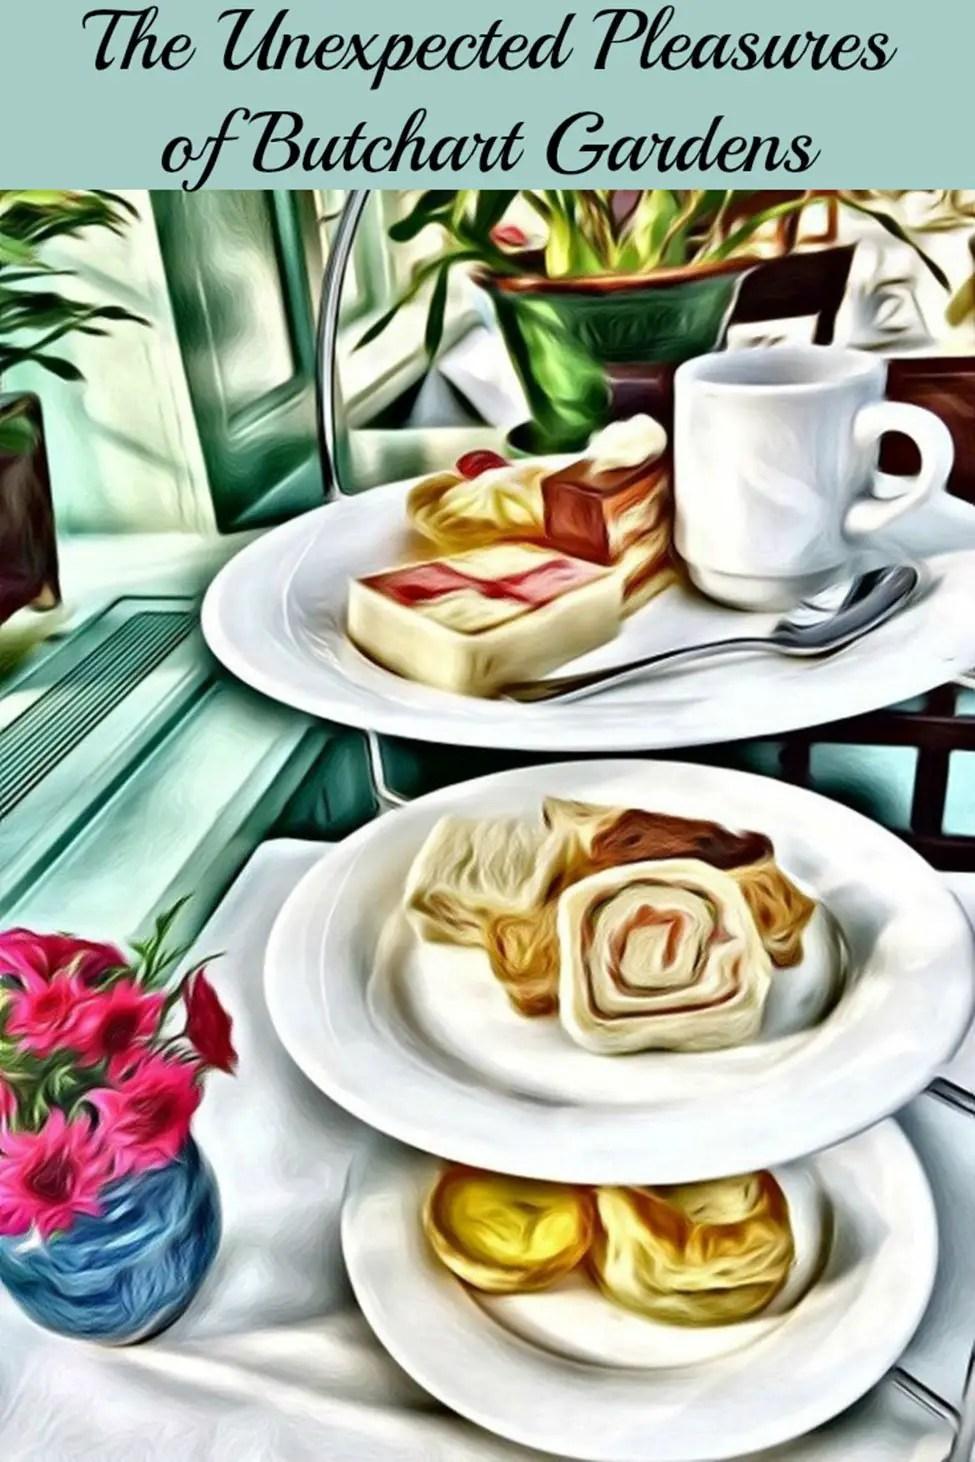 High Tea at Butchart Gardens | #Victoria #CulinaryTravel #FoodTravel